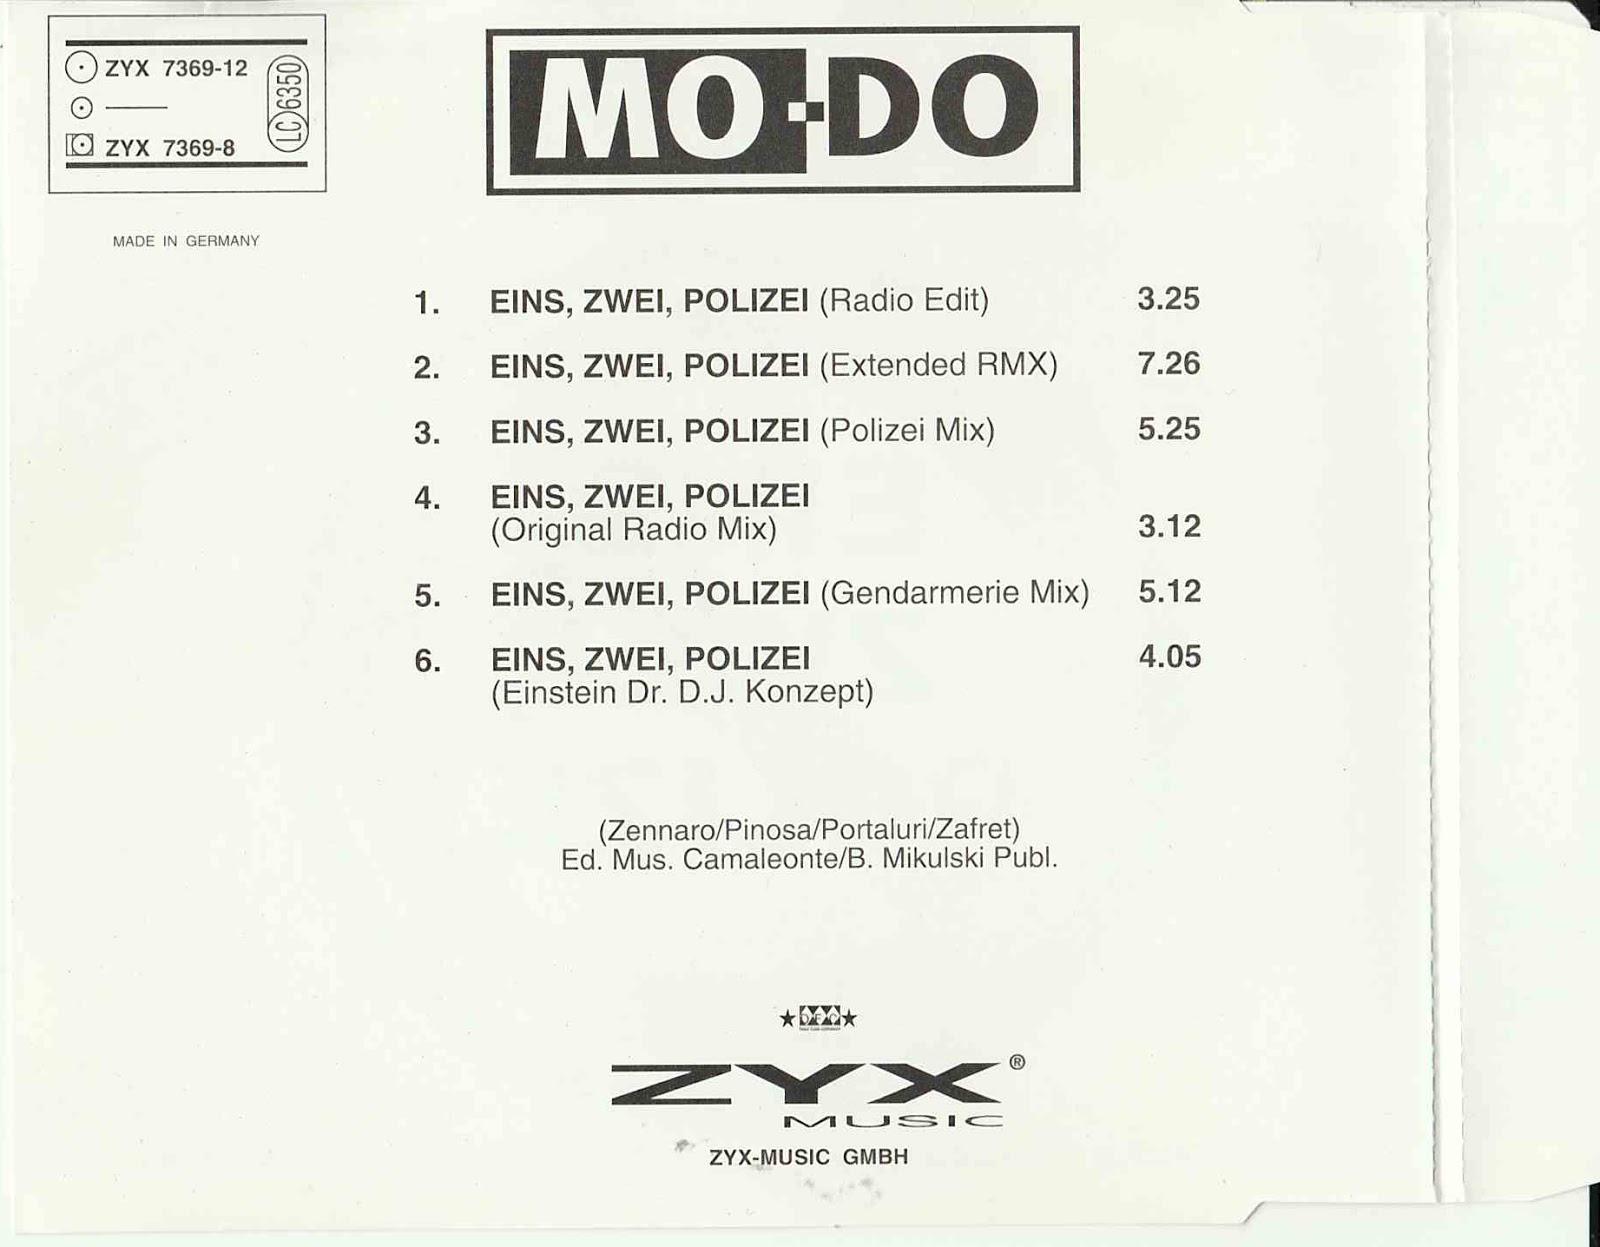 MO DO – EINS, ZWEI, POLIZEI remix cds 20 tr – Blog di Stefano ...